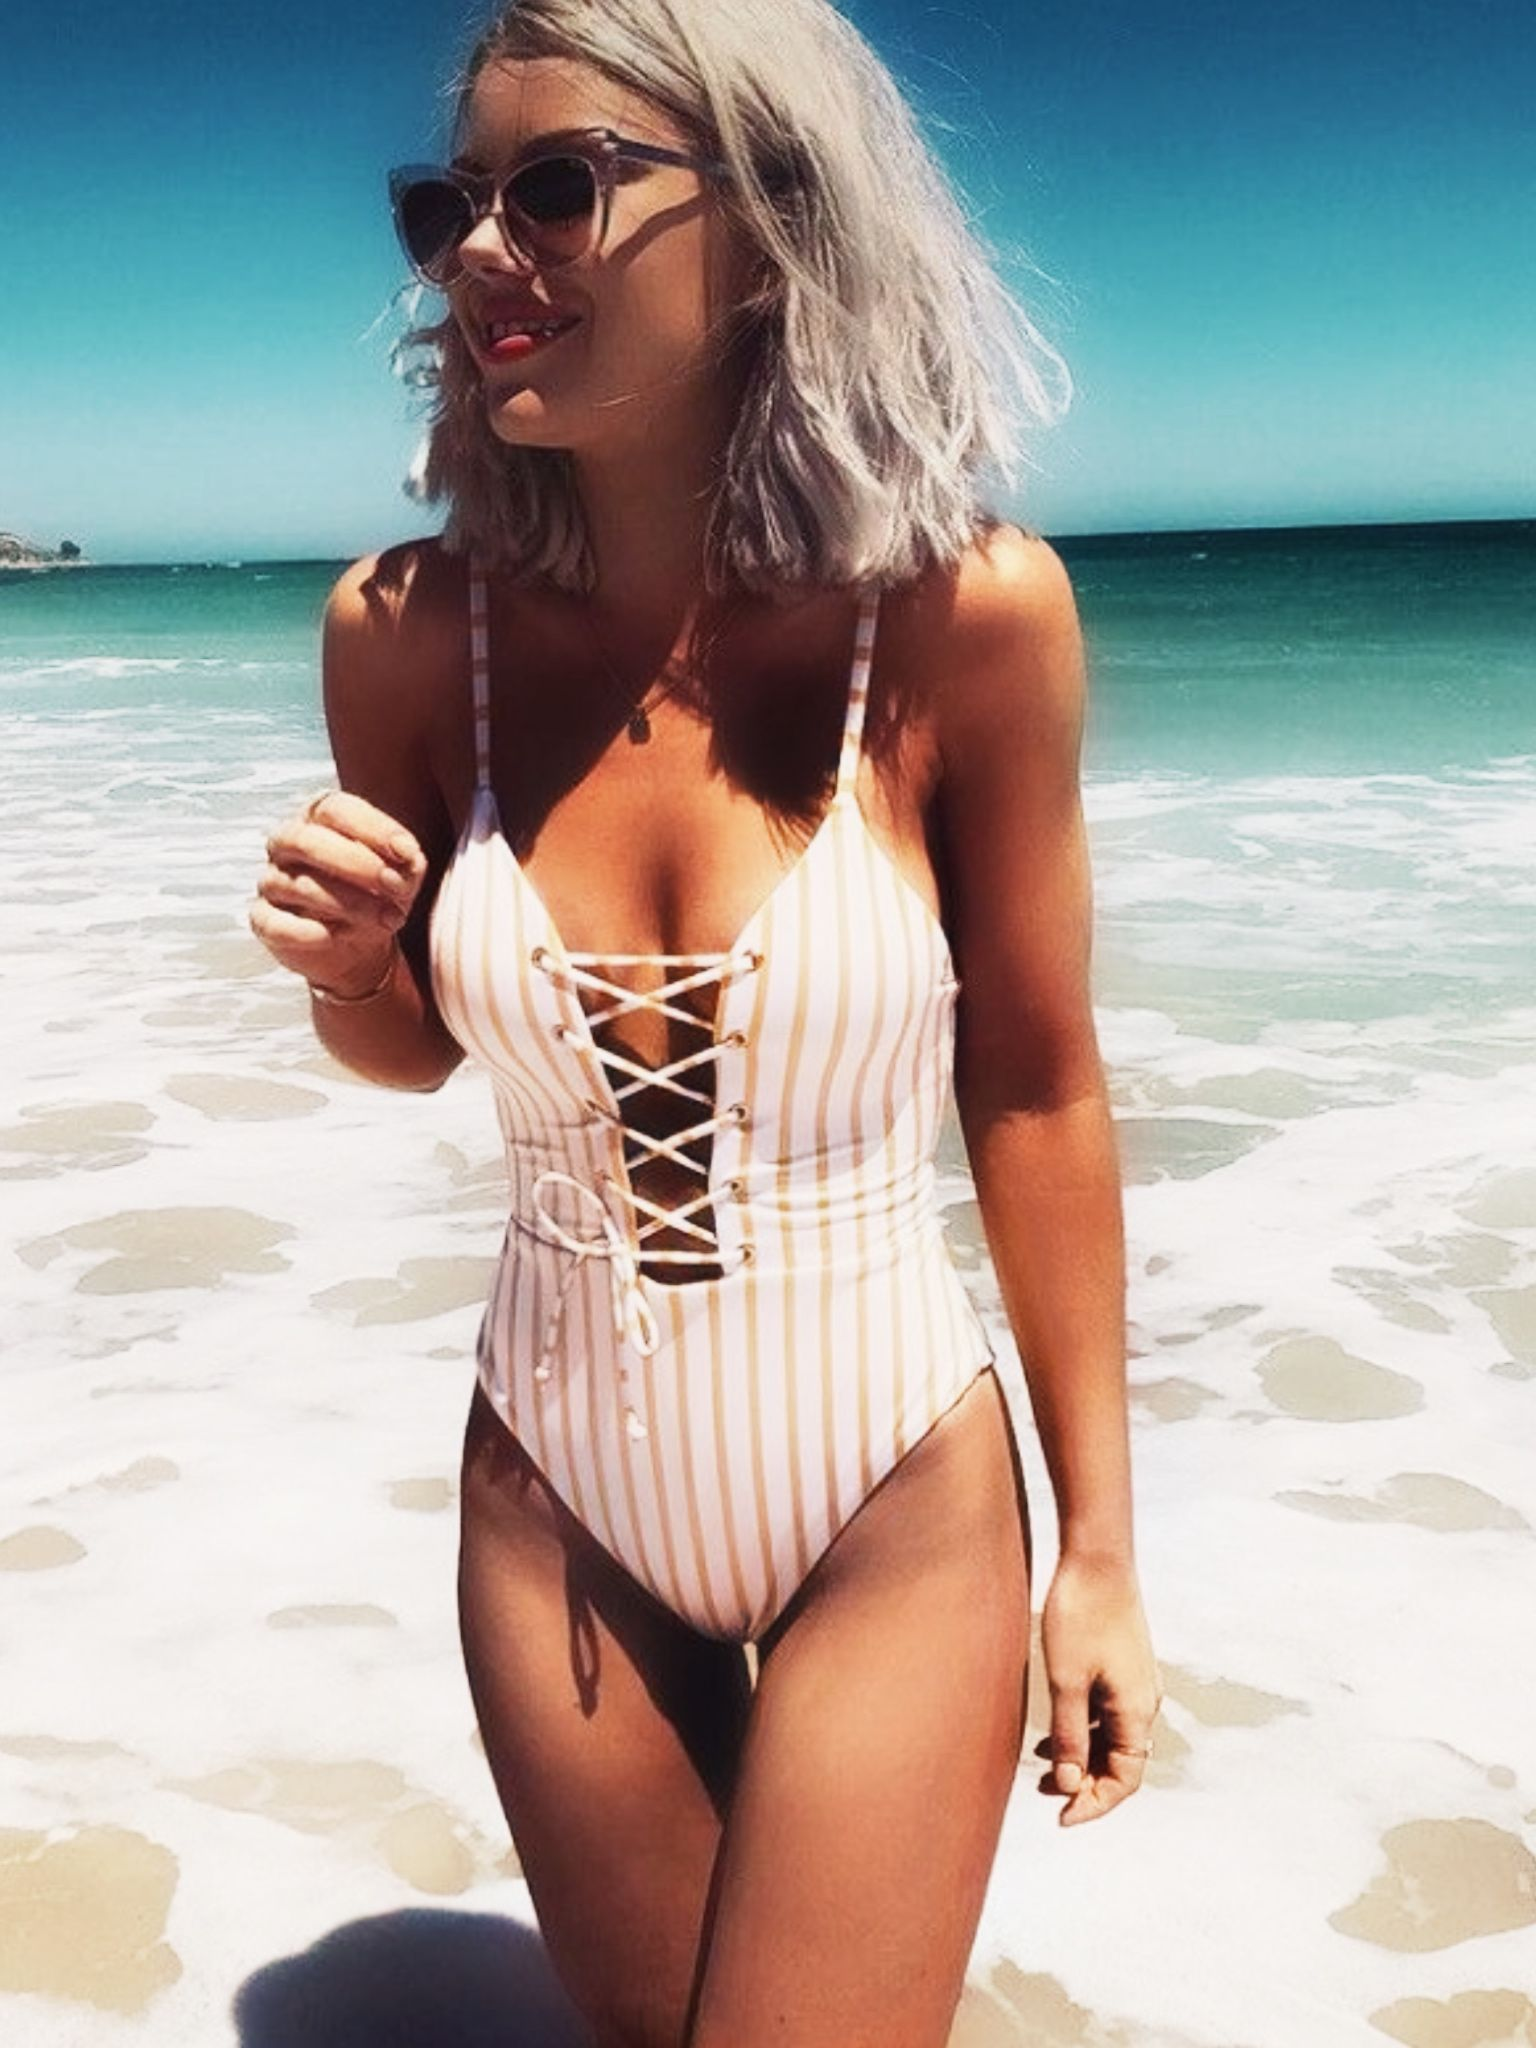 Bikini Megan Strand nudes (67 photo), Topless, Fappening, Feet, cameltoe 2017